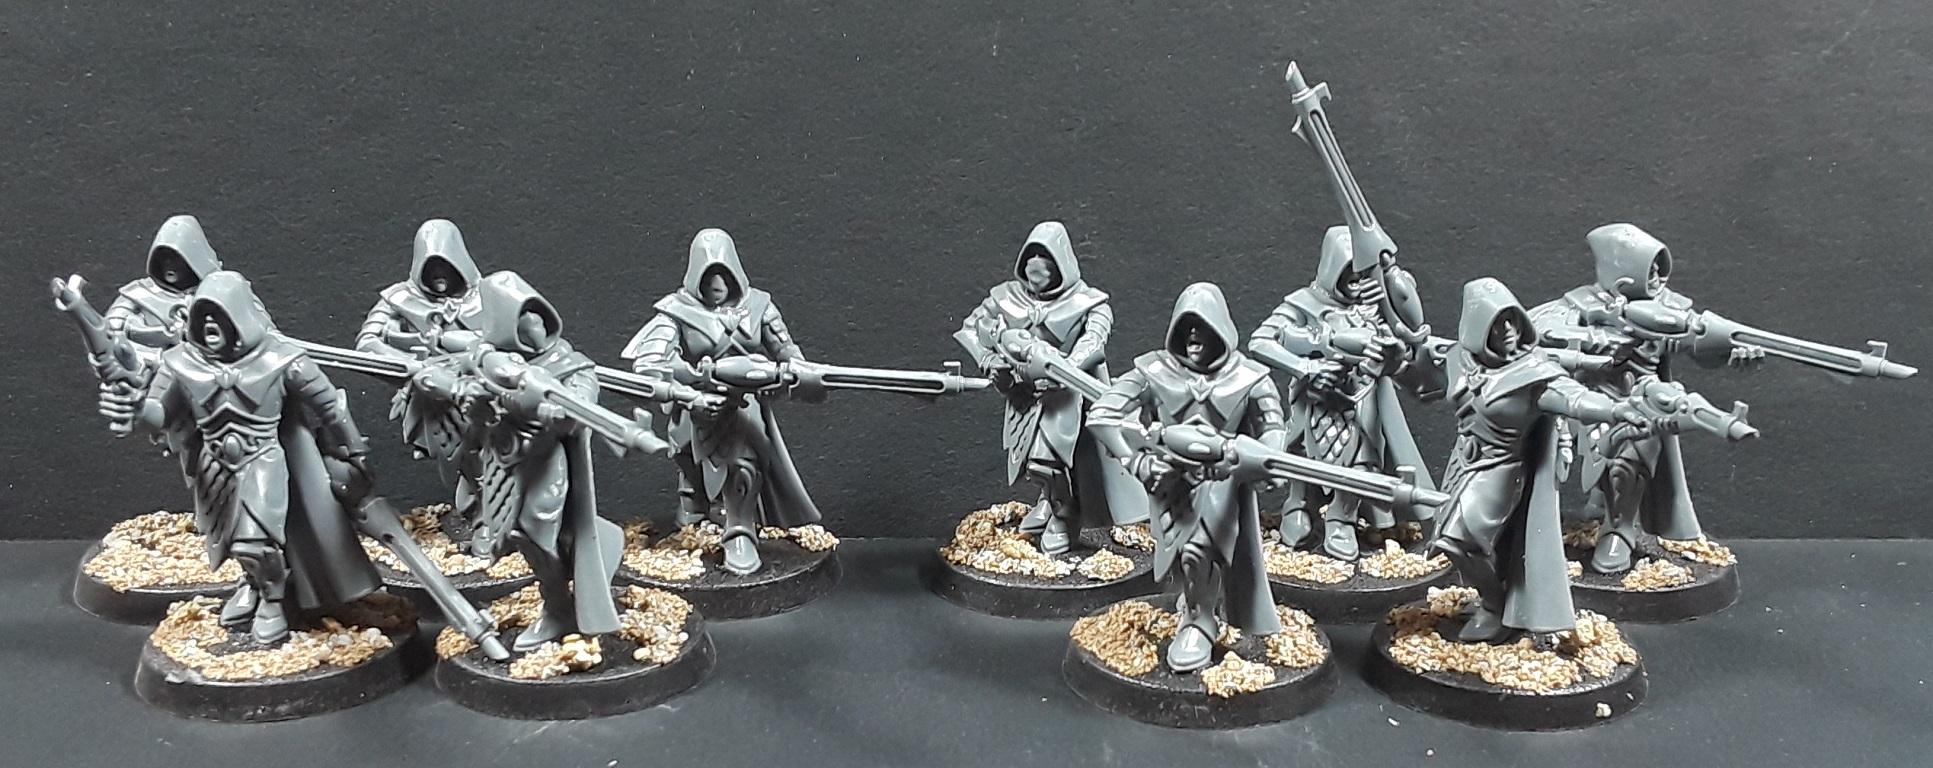 Mordian 7th Regiment: 40k Exodite Eldar - Rangers and